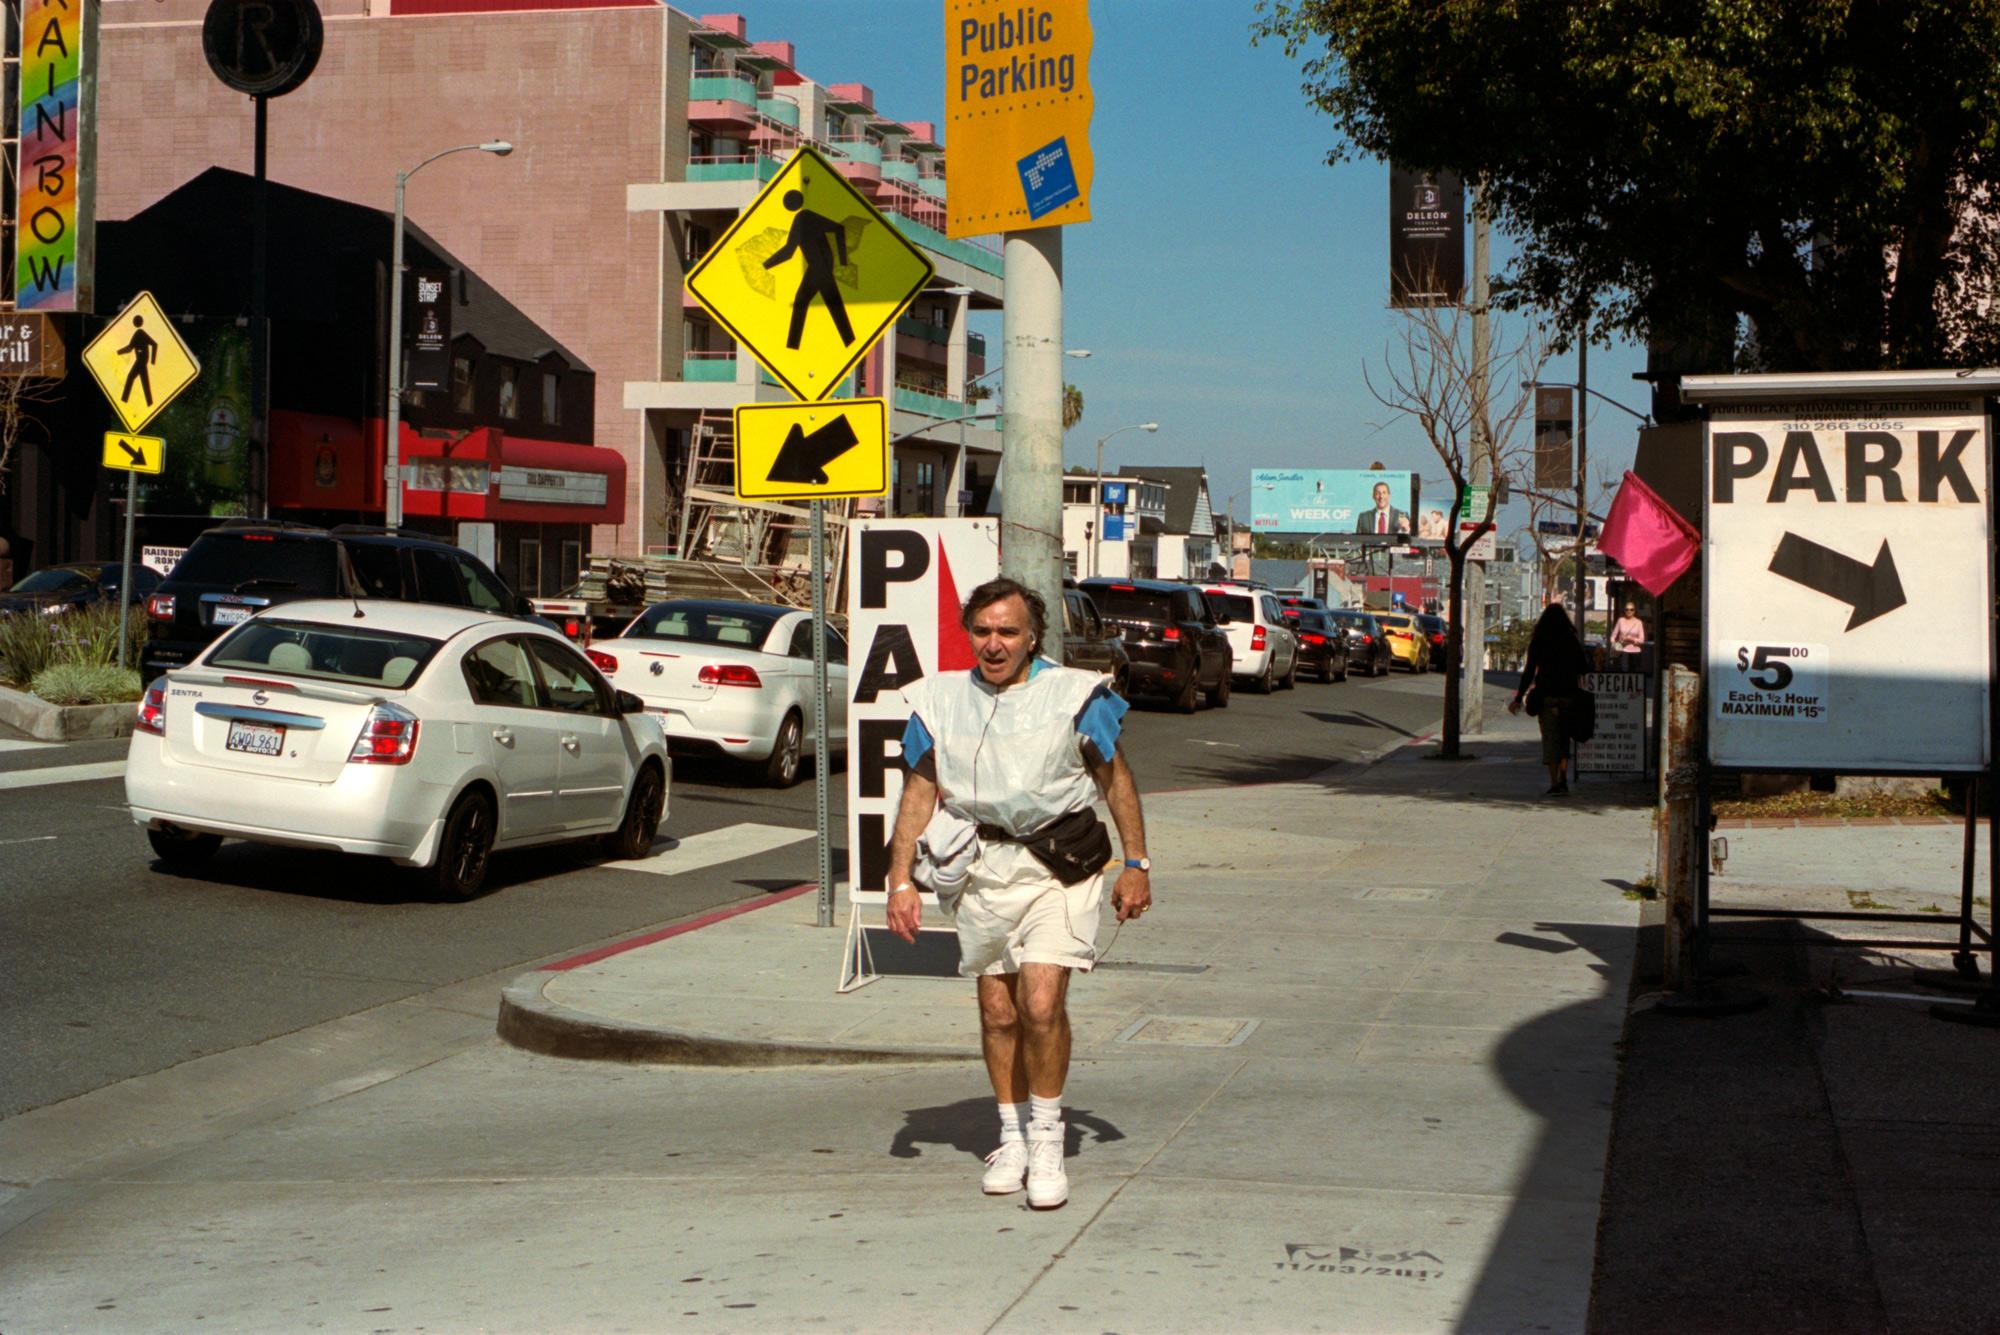 Power walking on Sunset Blvd, LA. Omy Your English, Photography By Ioannis Koussertari